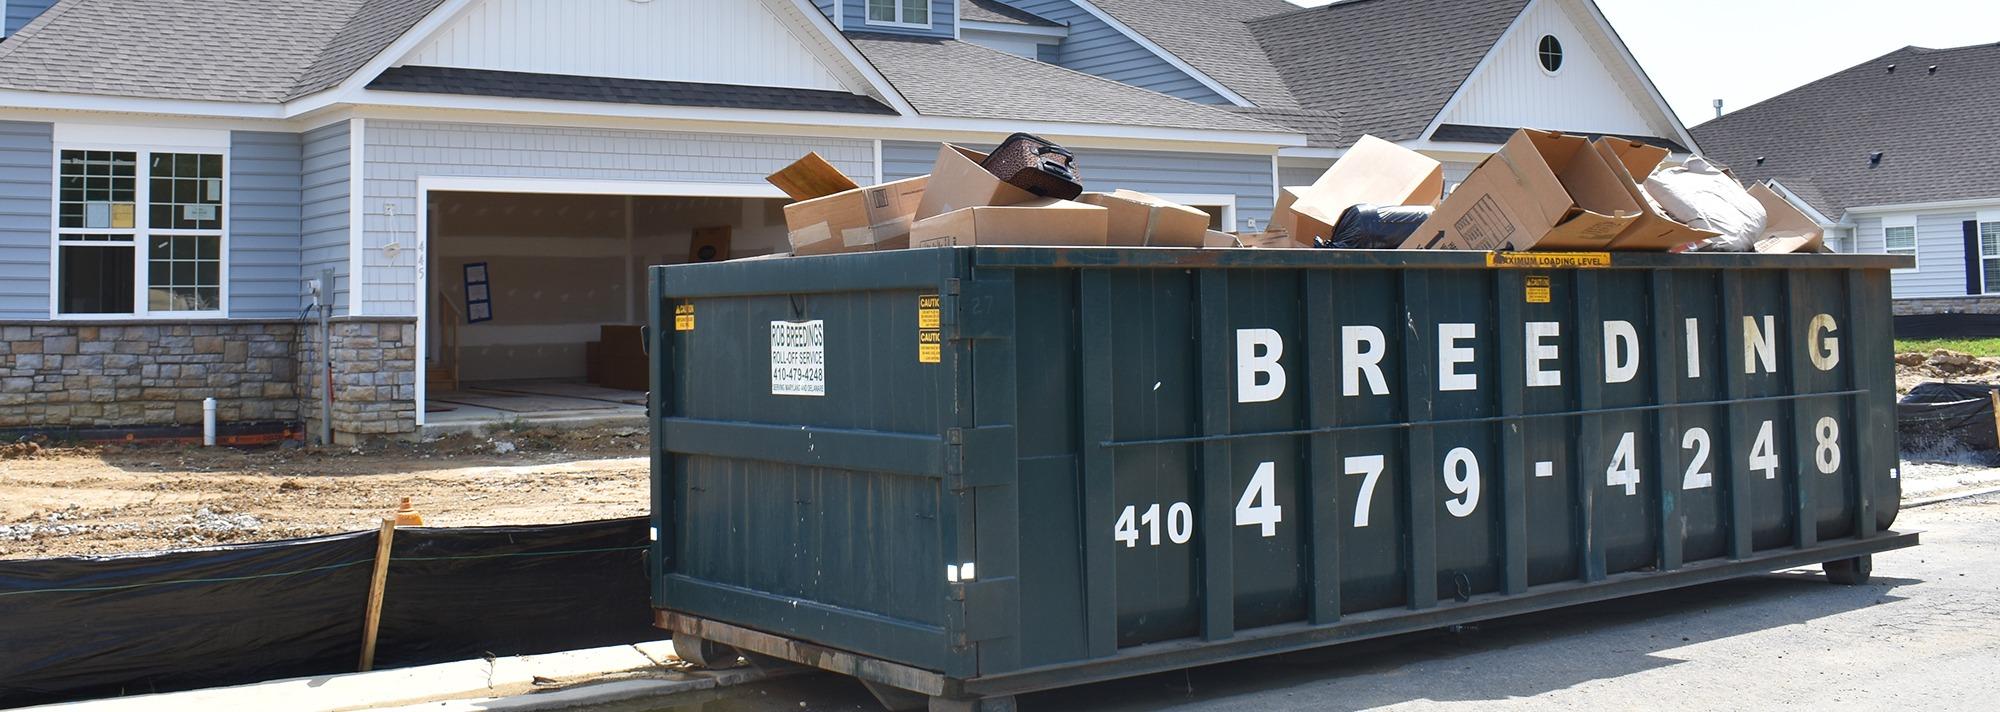 driveway dumpsters